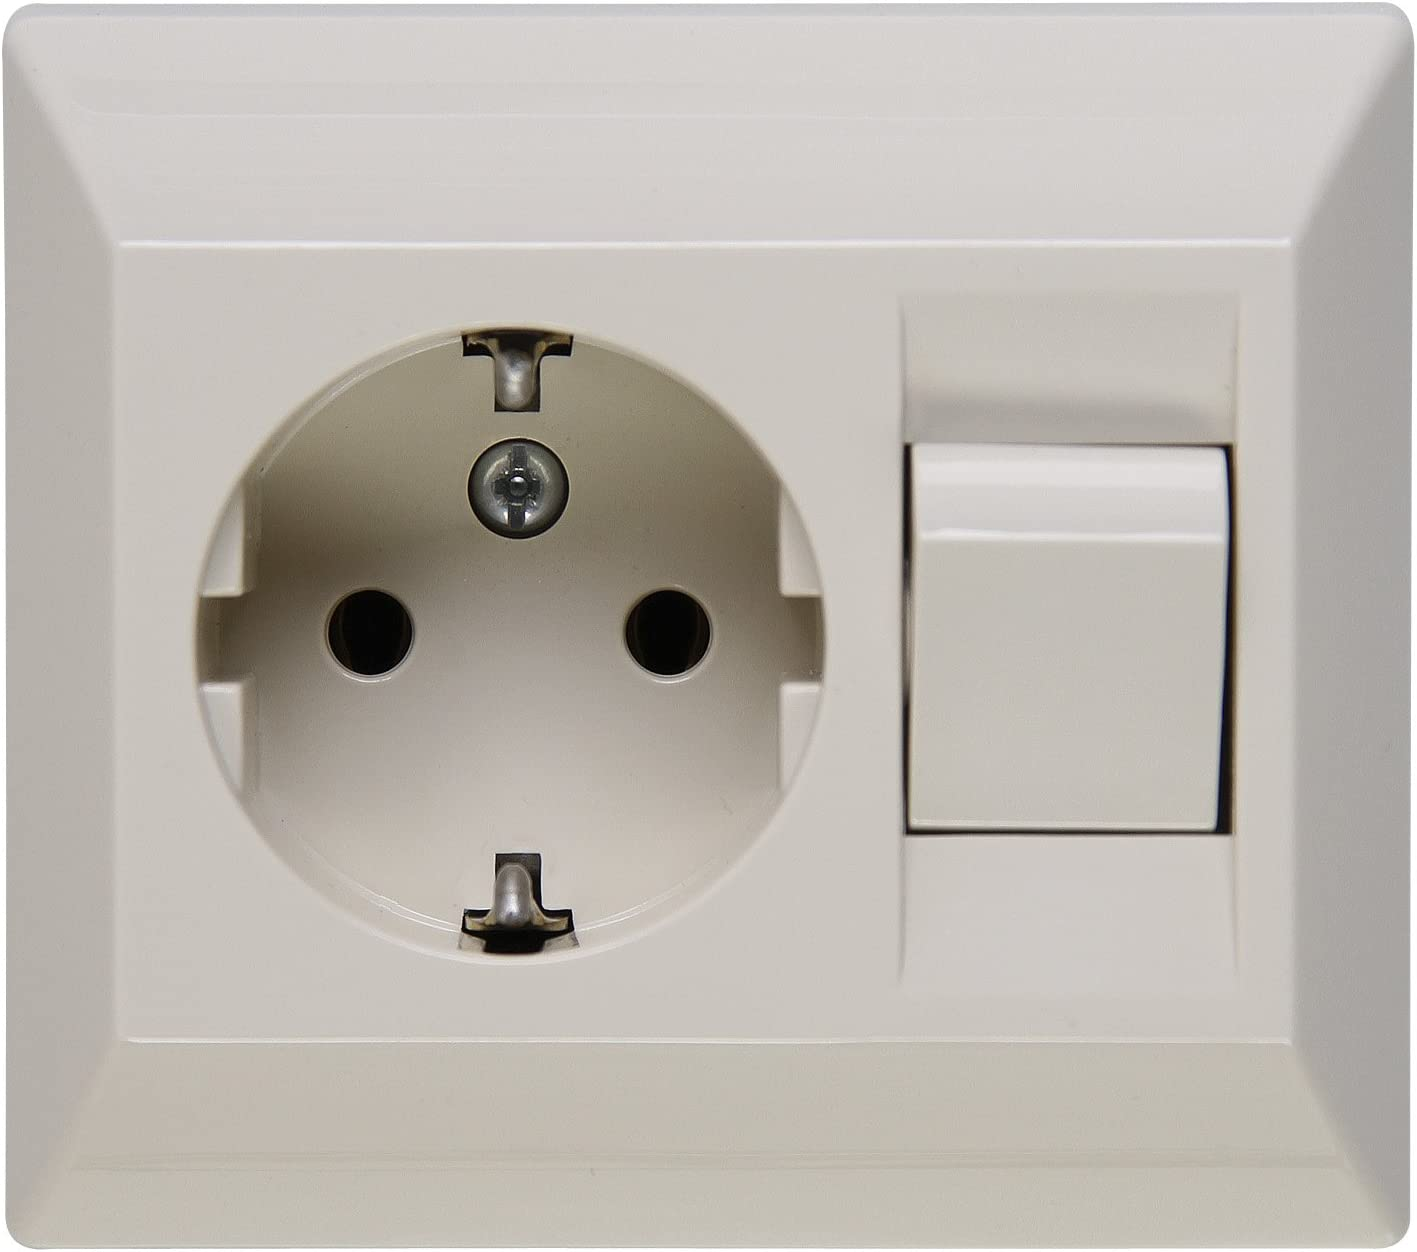 Marco para interruptor REV Ritter 500110551